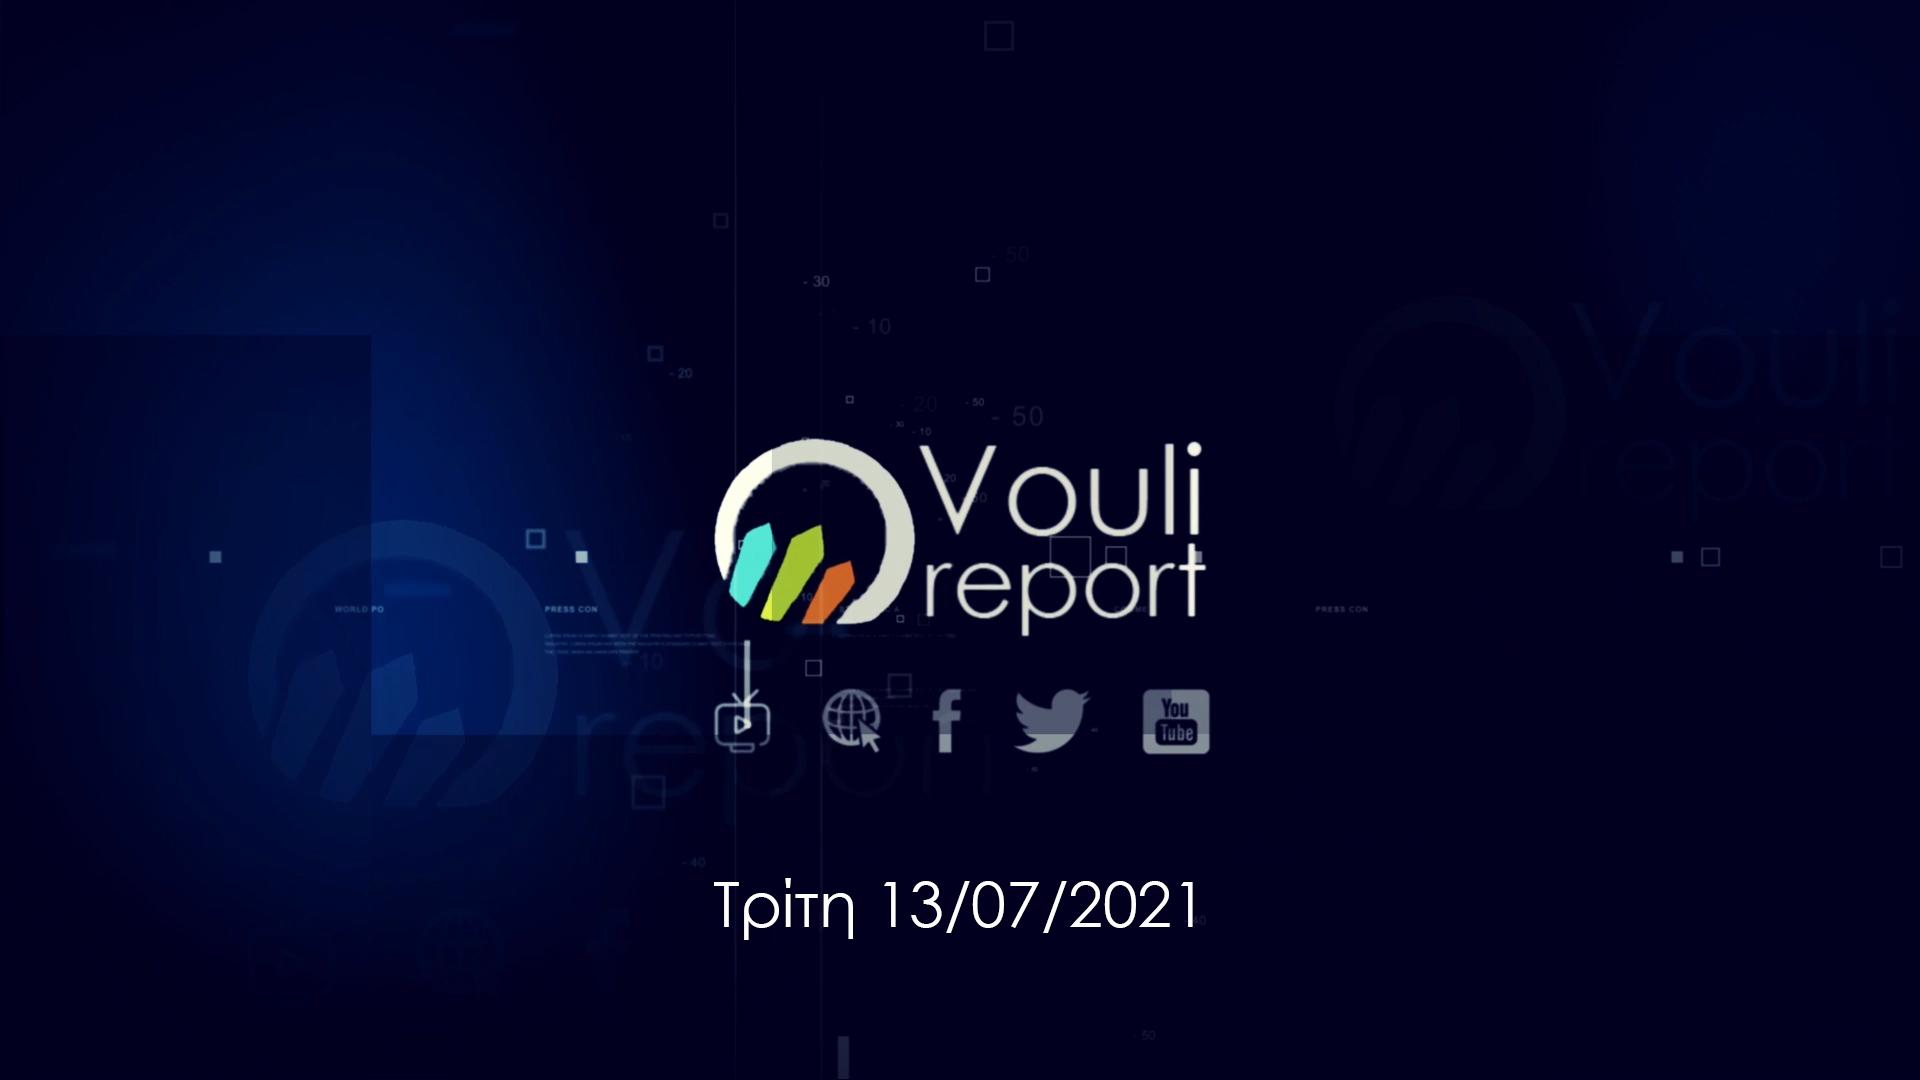 Vouli report   13/07/2021, 6μμ